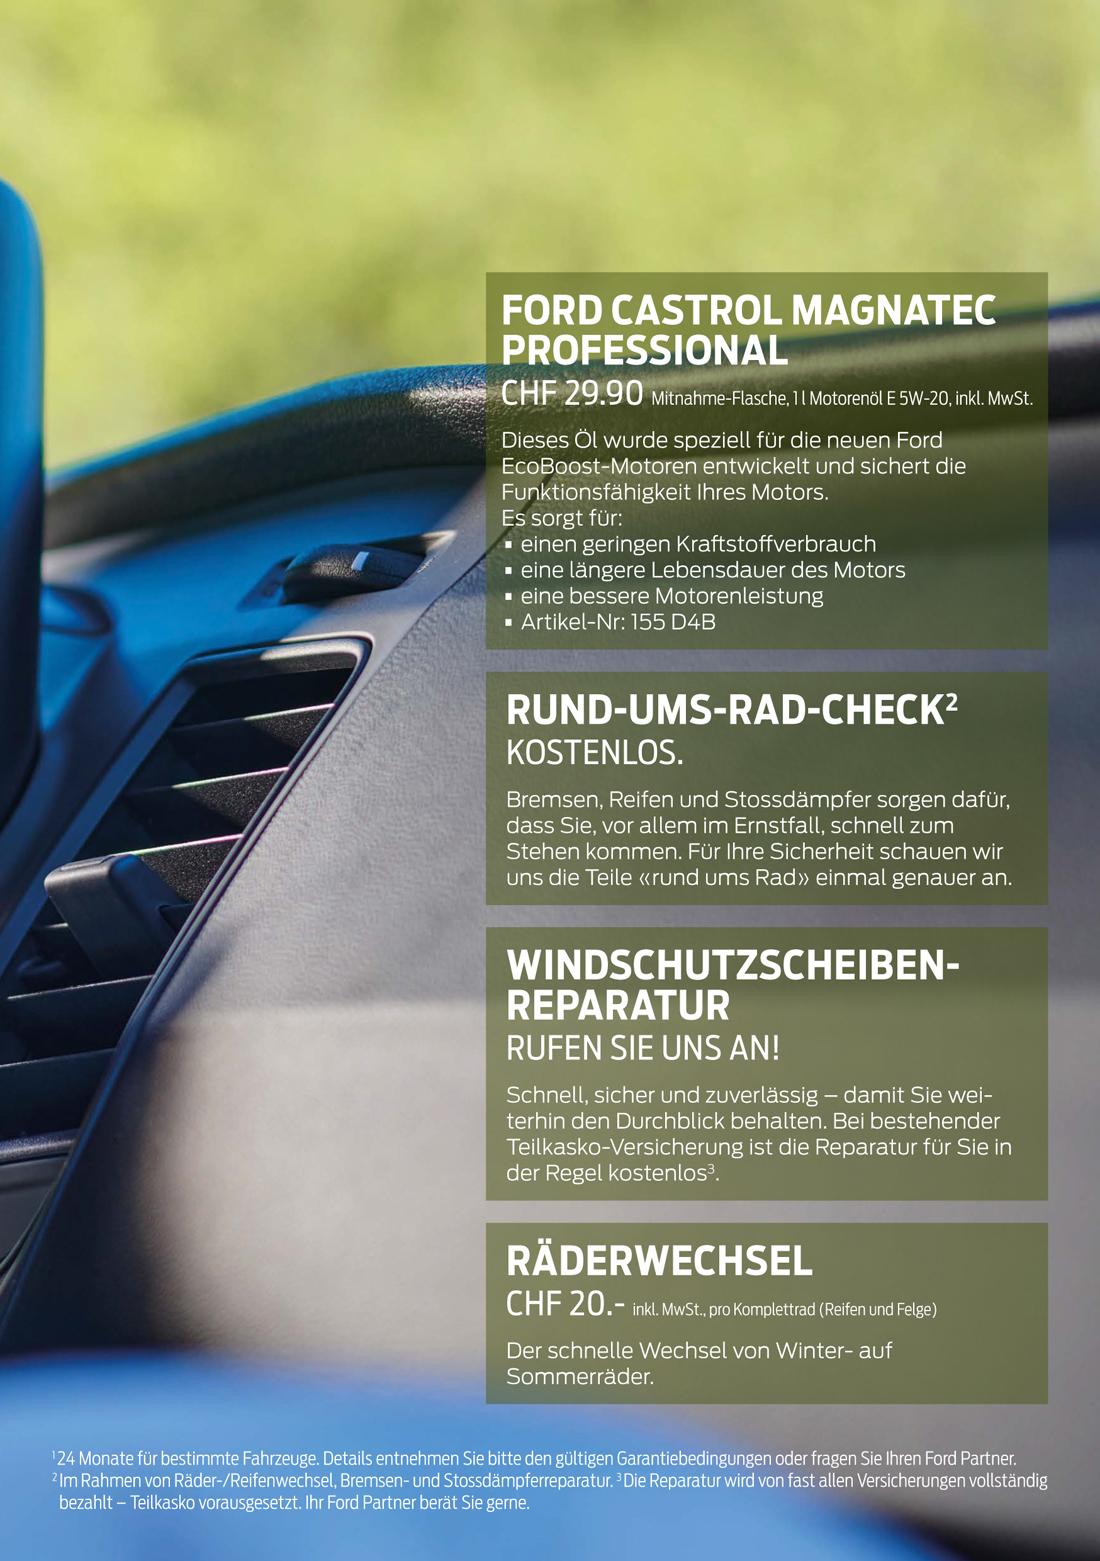 2021-Ford_Fruehlingskampagne_Broschuere-Seite-3a-2021-03-02.jpg#asset:719